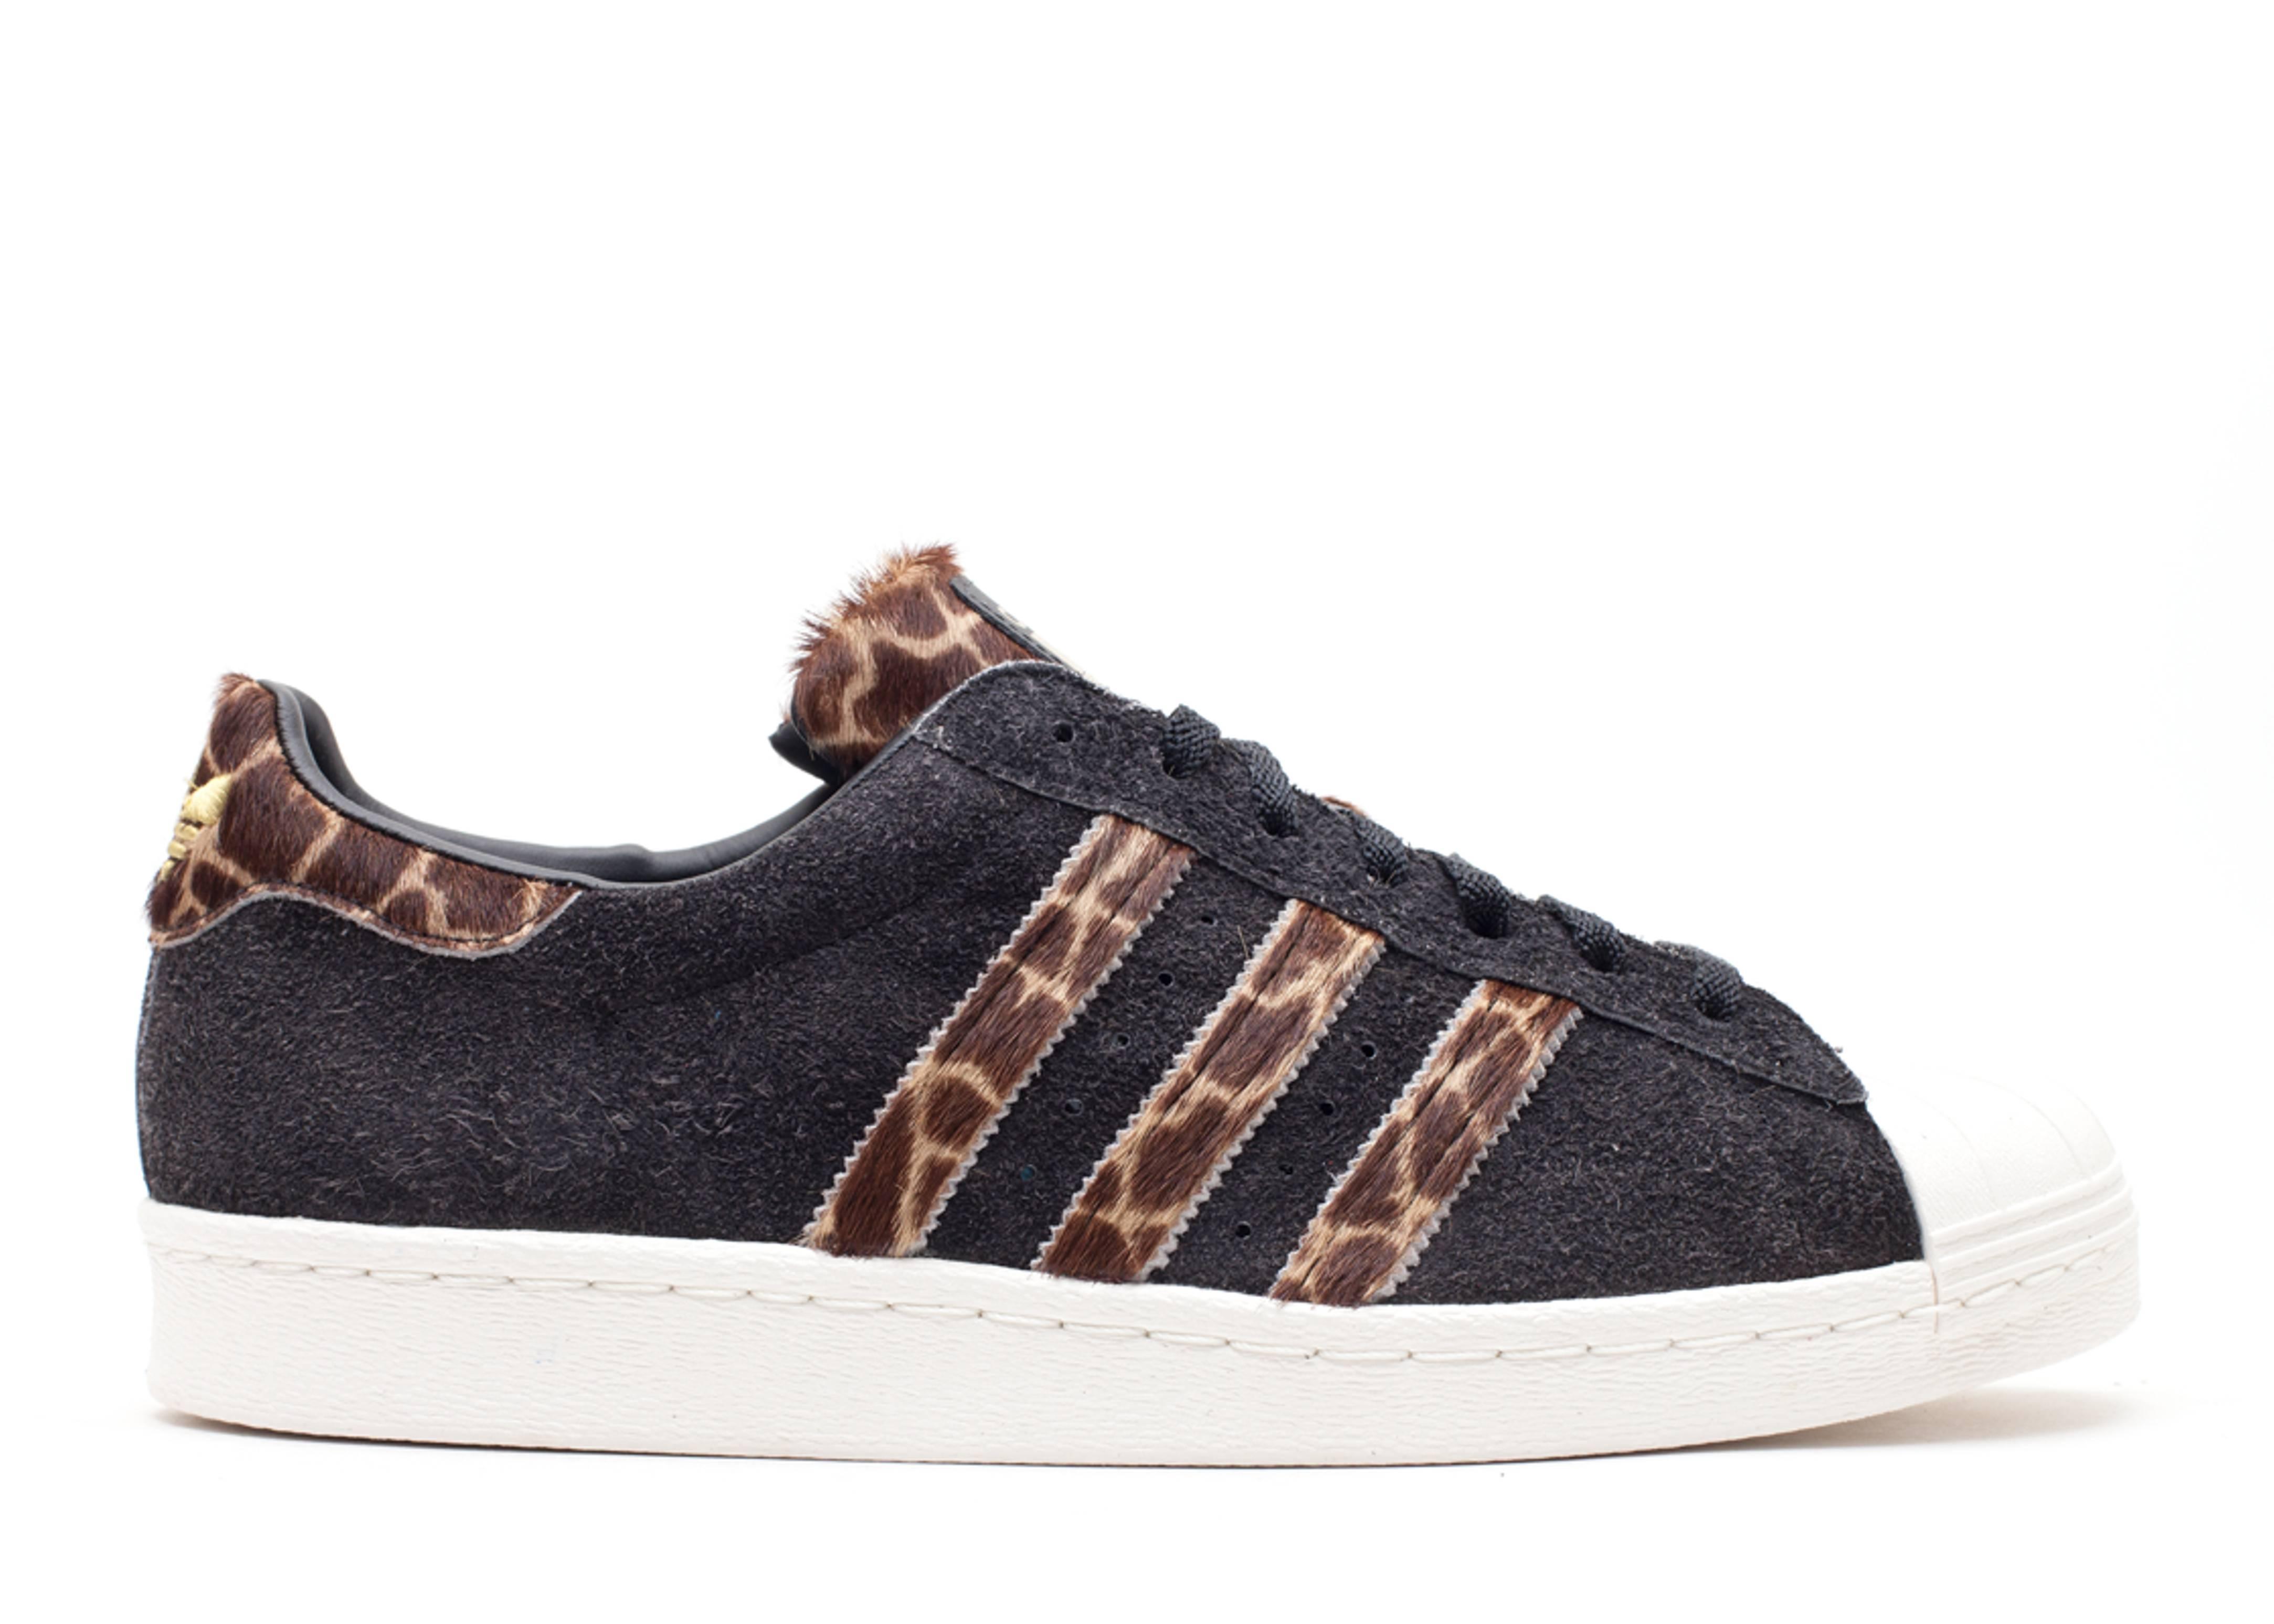 ae5c0763d237 Superstar 80s Grf - Adidas - q21903 - wheat black1 chalk2